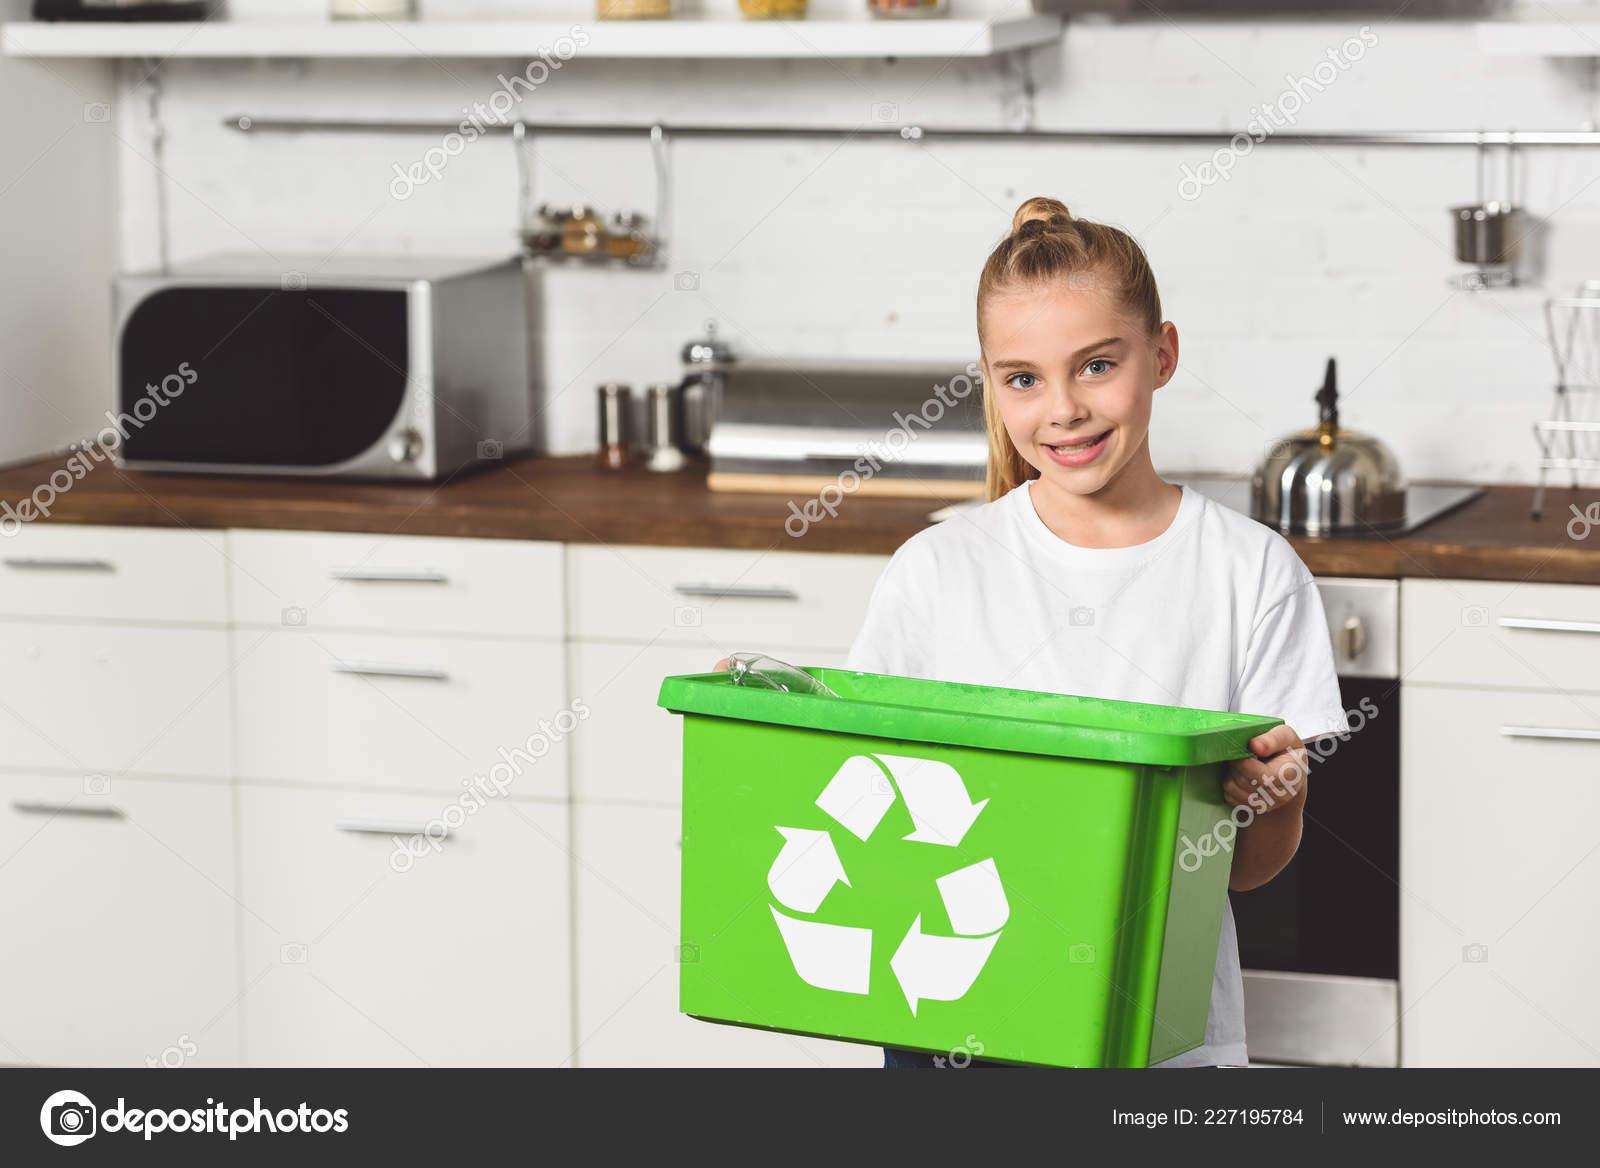 kitchen recycle bin 9 piece table set 微笑的孩子站在厨房与绿色回收盒 图库照片 c igorvetushko 227195784